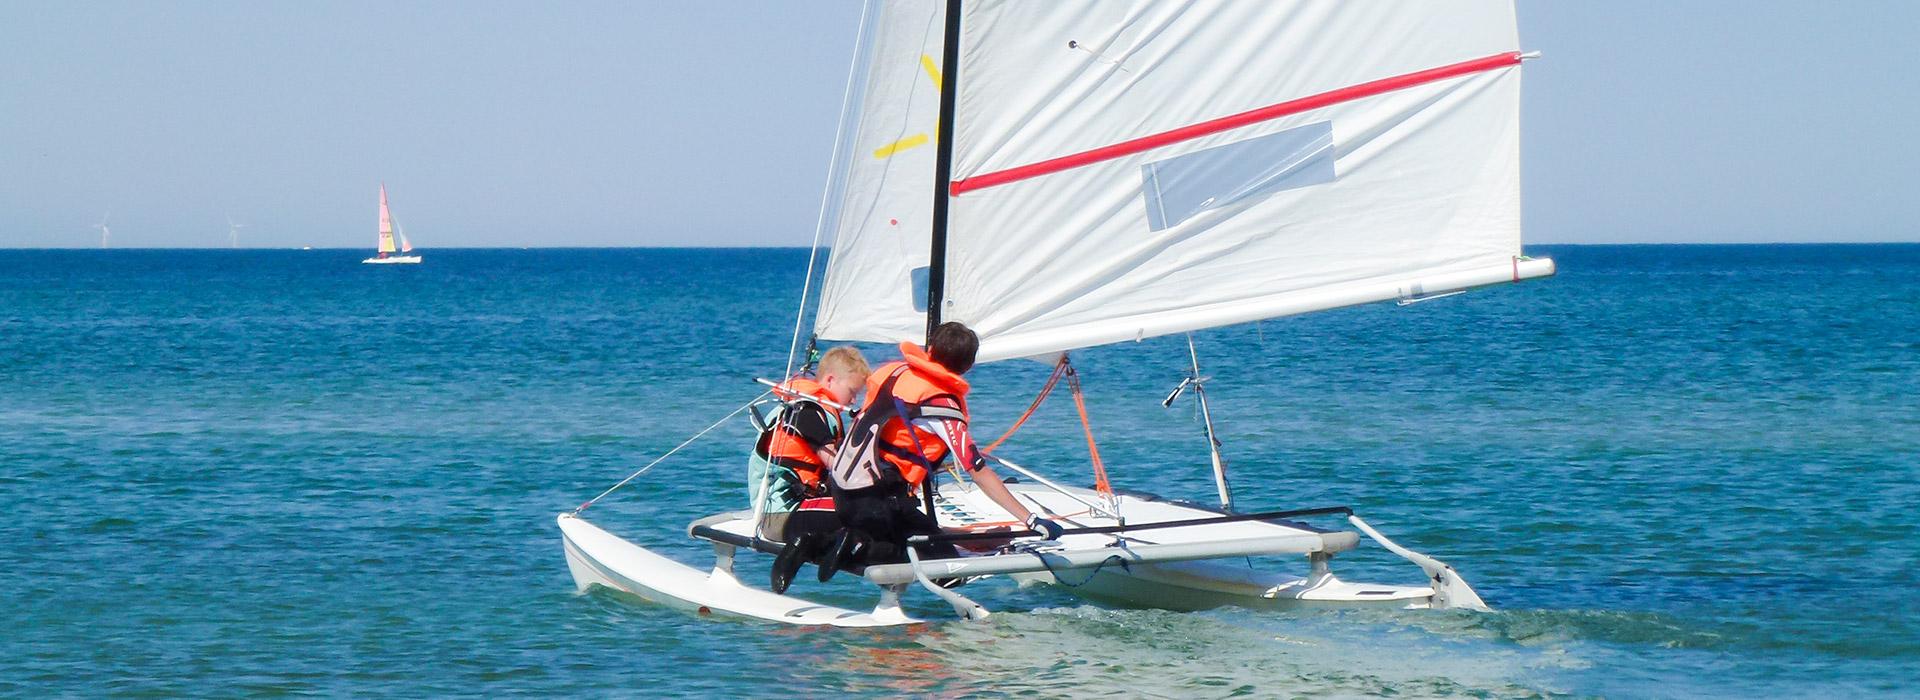 segeln-an-der-ostsee